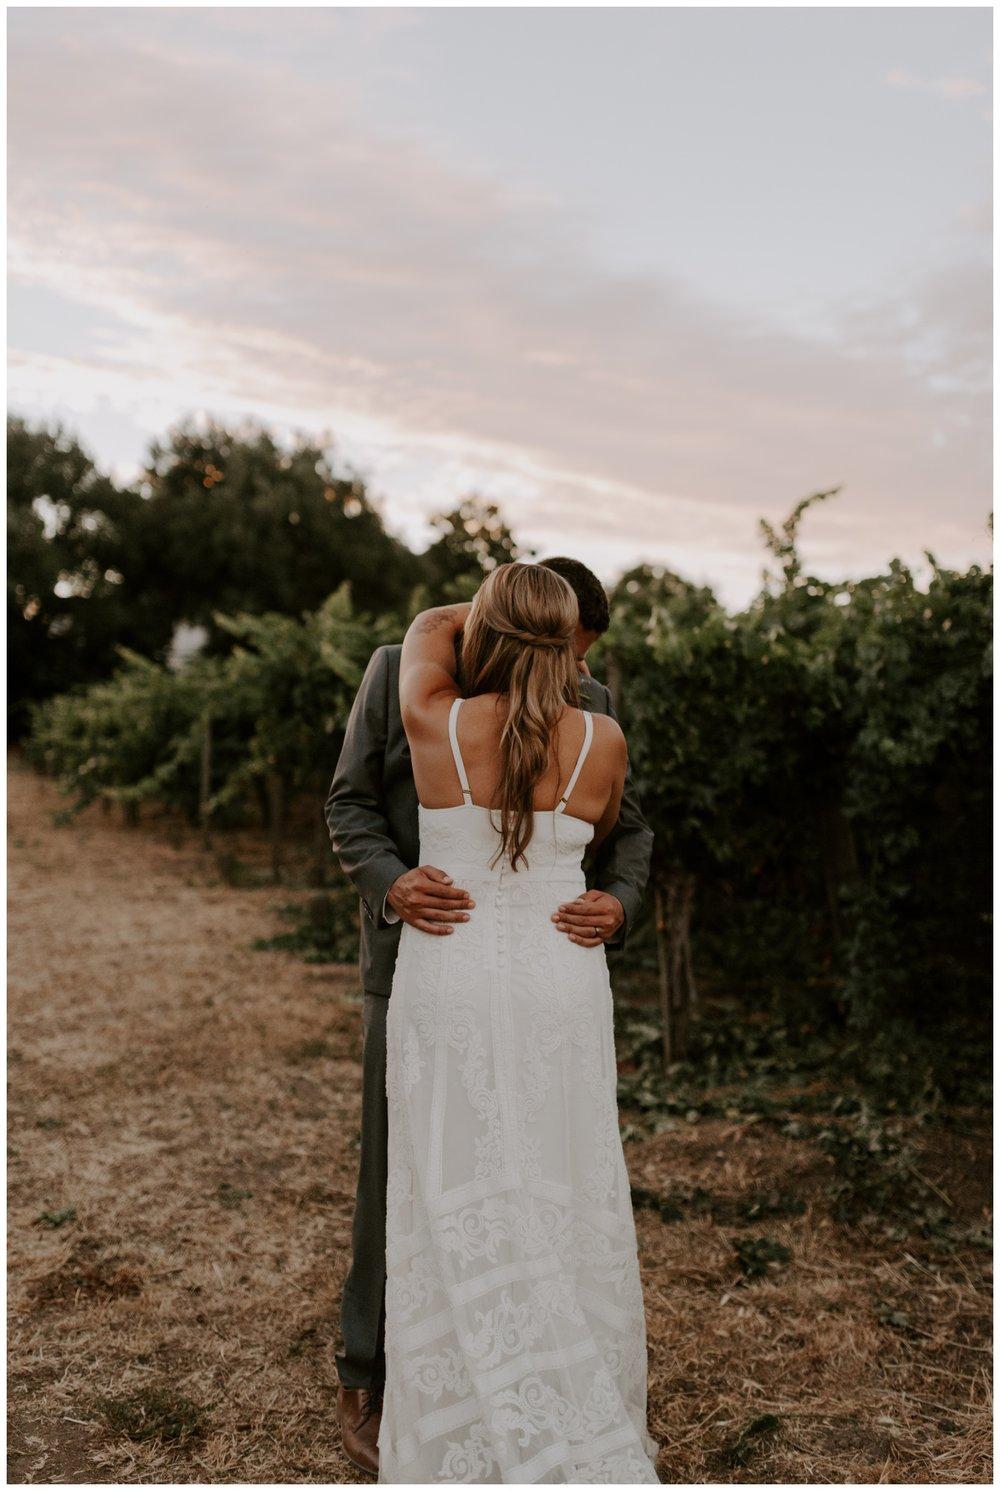 Napa Valley Backyard Wedding and Reception at Elizabeth Spencer Winery | Jessica Heron Images 189.jpg